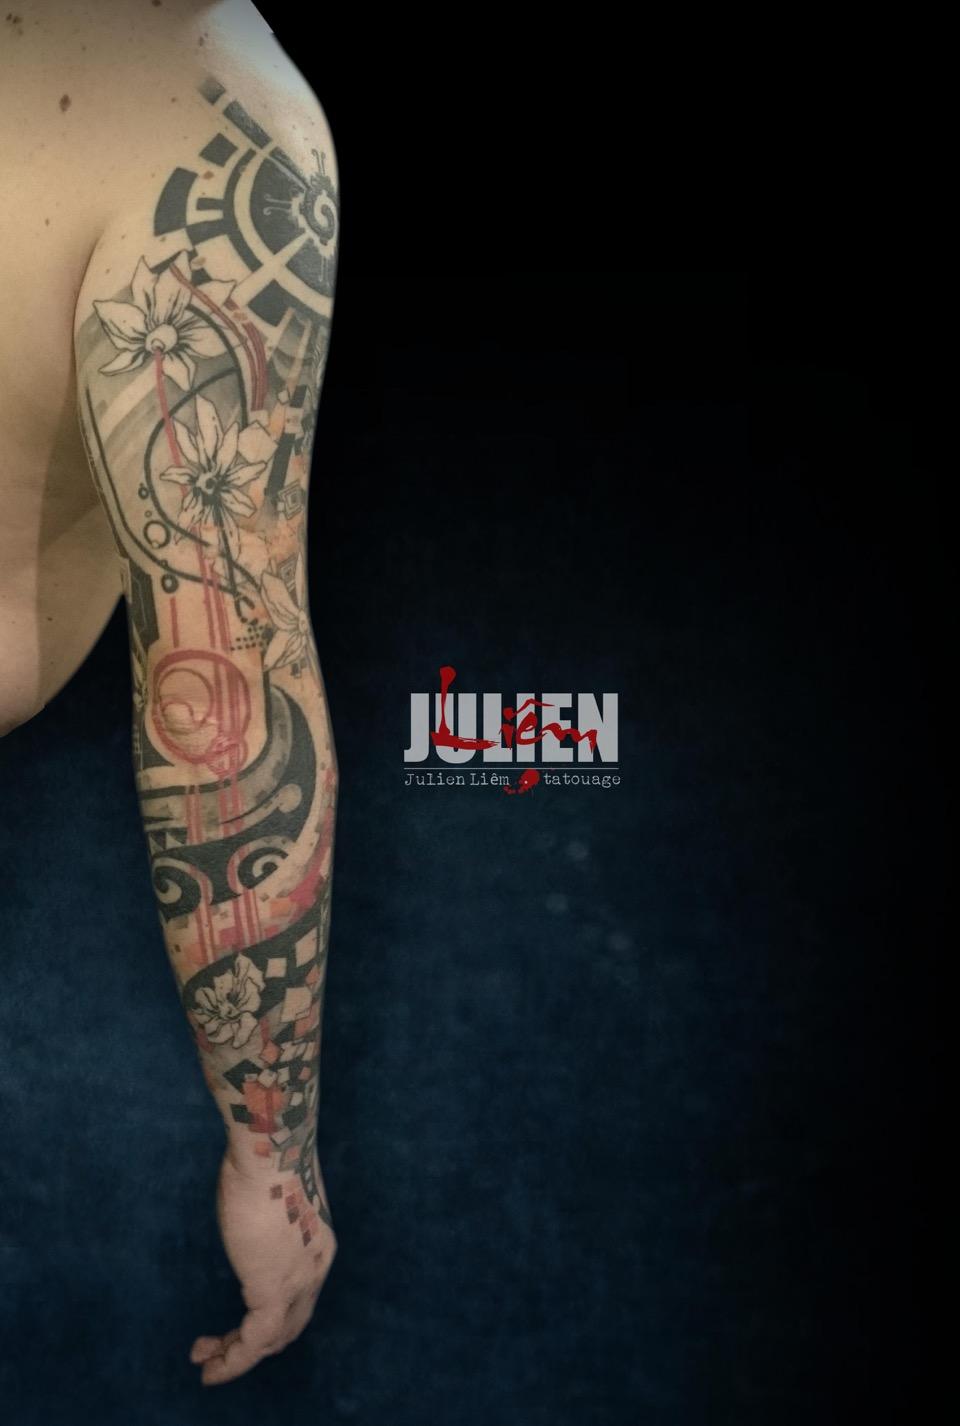 julien-tatouage-marseille_jeremy-corsini-2